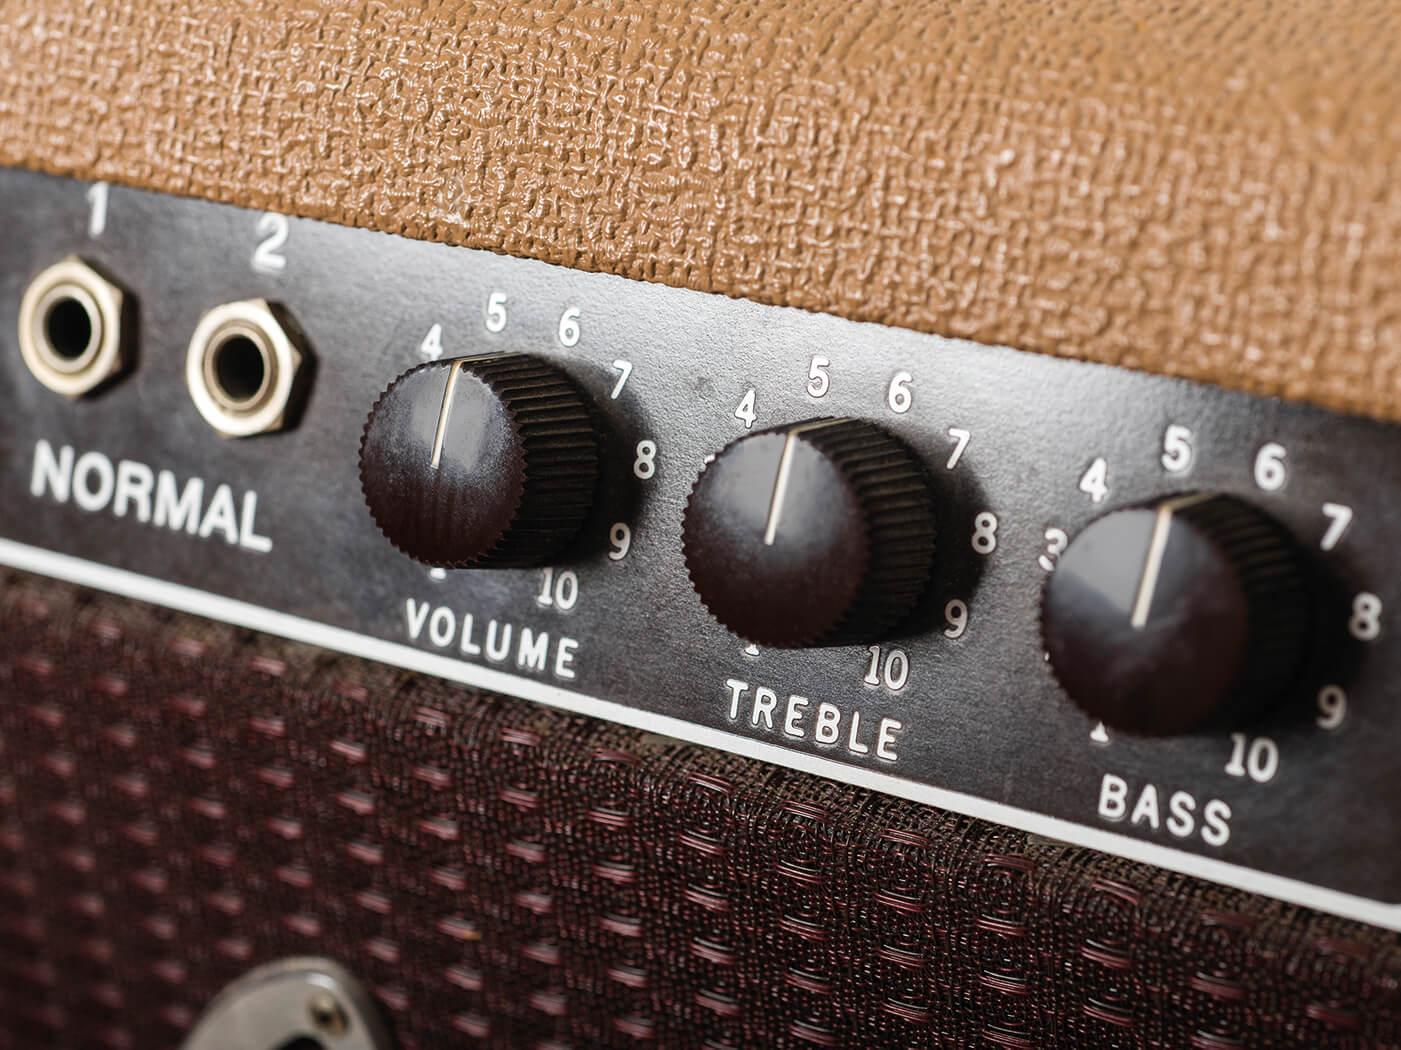 1961 Fender Pro Amp controls